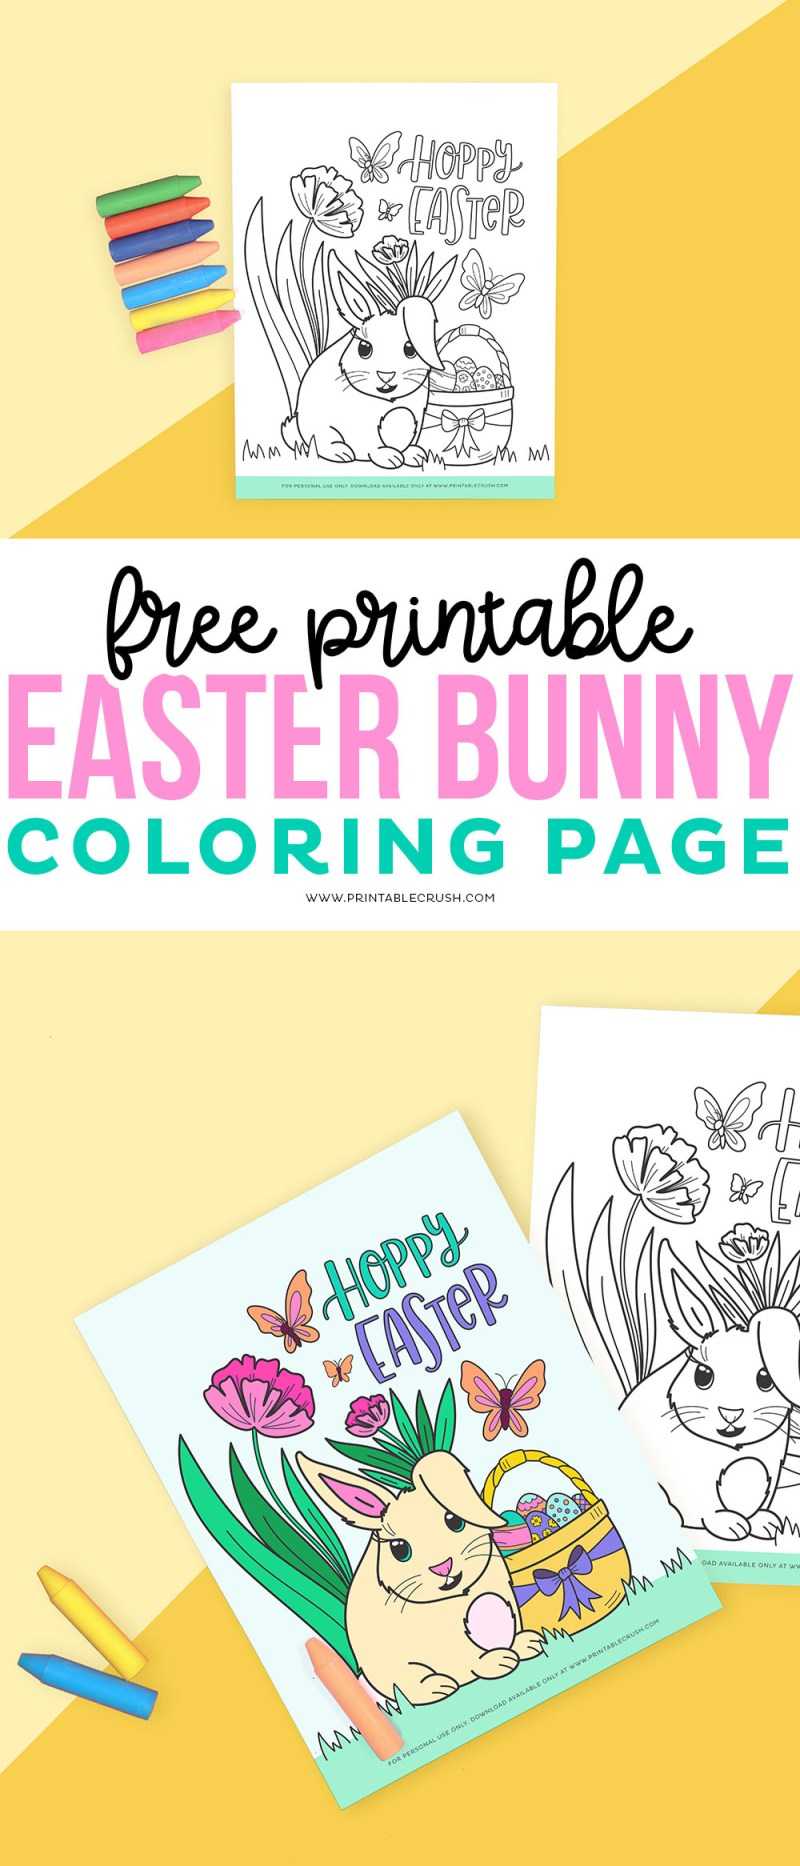 https://i2.wp.com/printablecrush.com/wp-content/uploads/2021/02/Free-Printable-Coloring-Page-for-Easter-Free-Easter-Coloring-Page-Printable-Printable-Crush.jpg?resize=800%2C1866&ssl=1